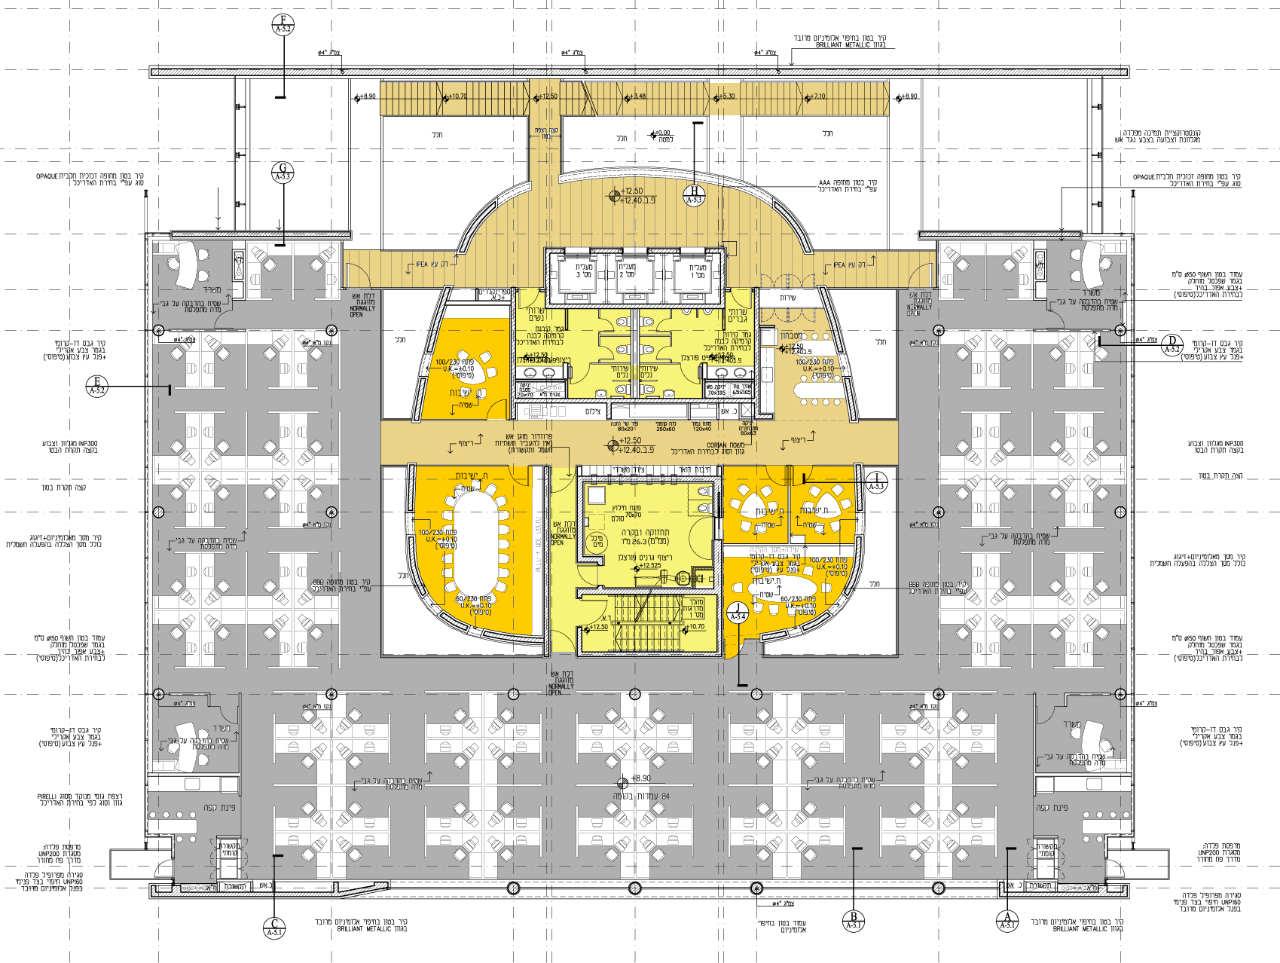 Cannon house office building floor plan escortsea for Building home floor plans